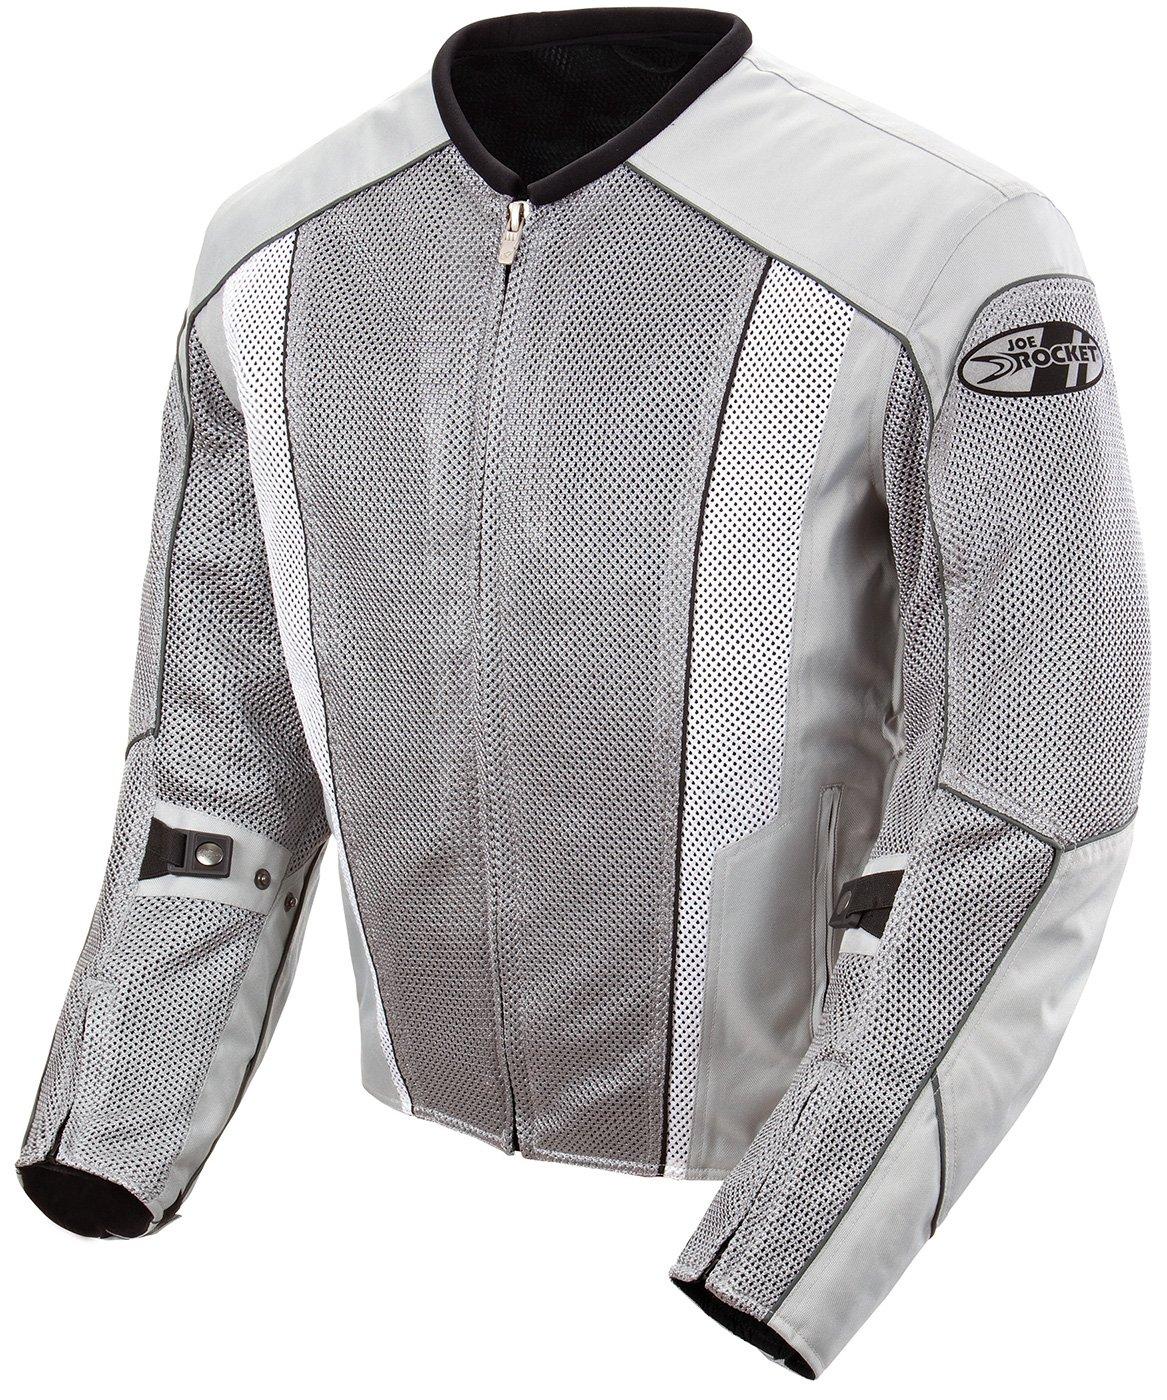 Gray//Black, Large Tall Joe Rocket Phoenix 5.0 Mens Mesh Motorcycle Riding Jacket